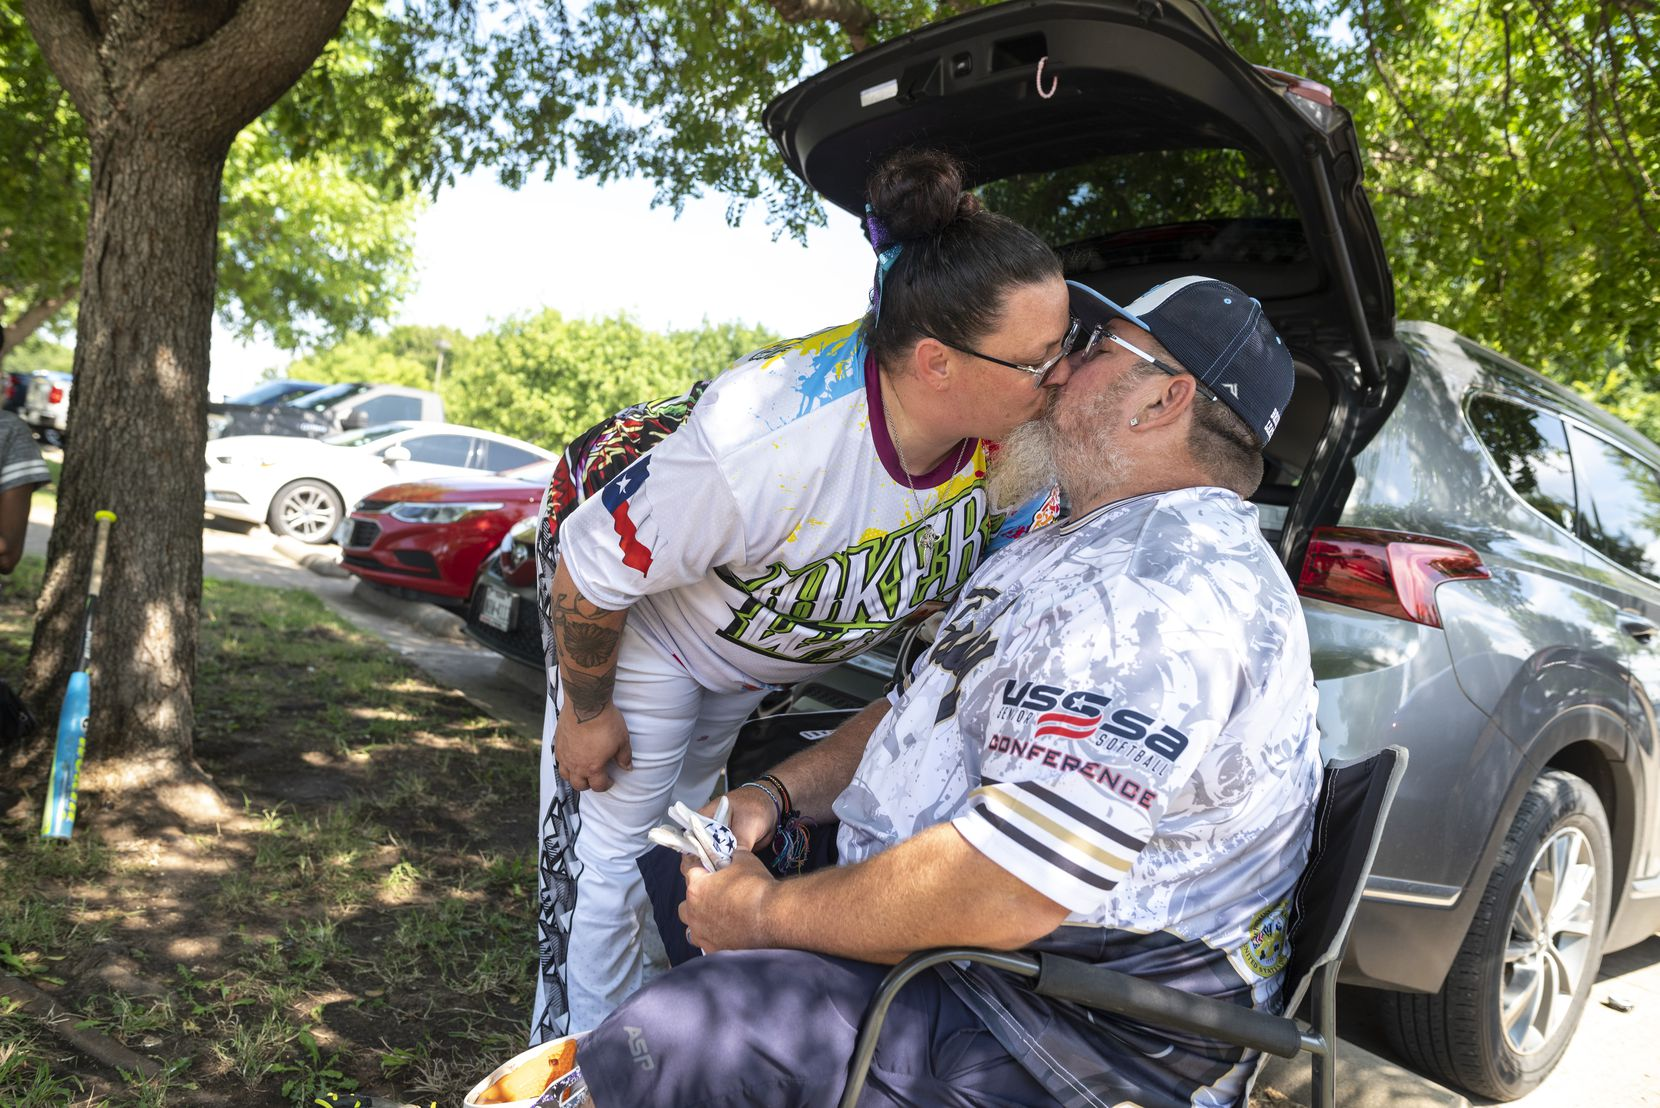 Natasha Reeves gives her husband, Jim Reeves, a kiss before joining a softball game at Kiest Park.